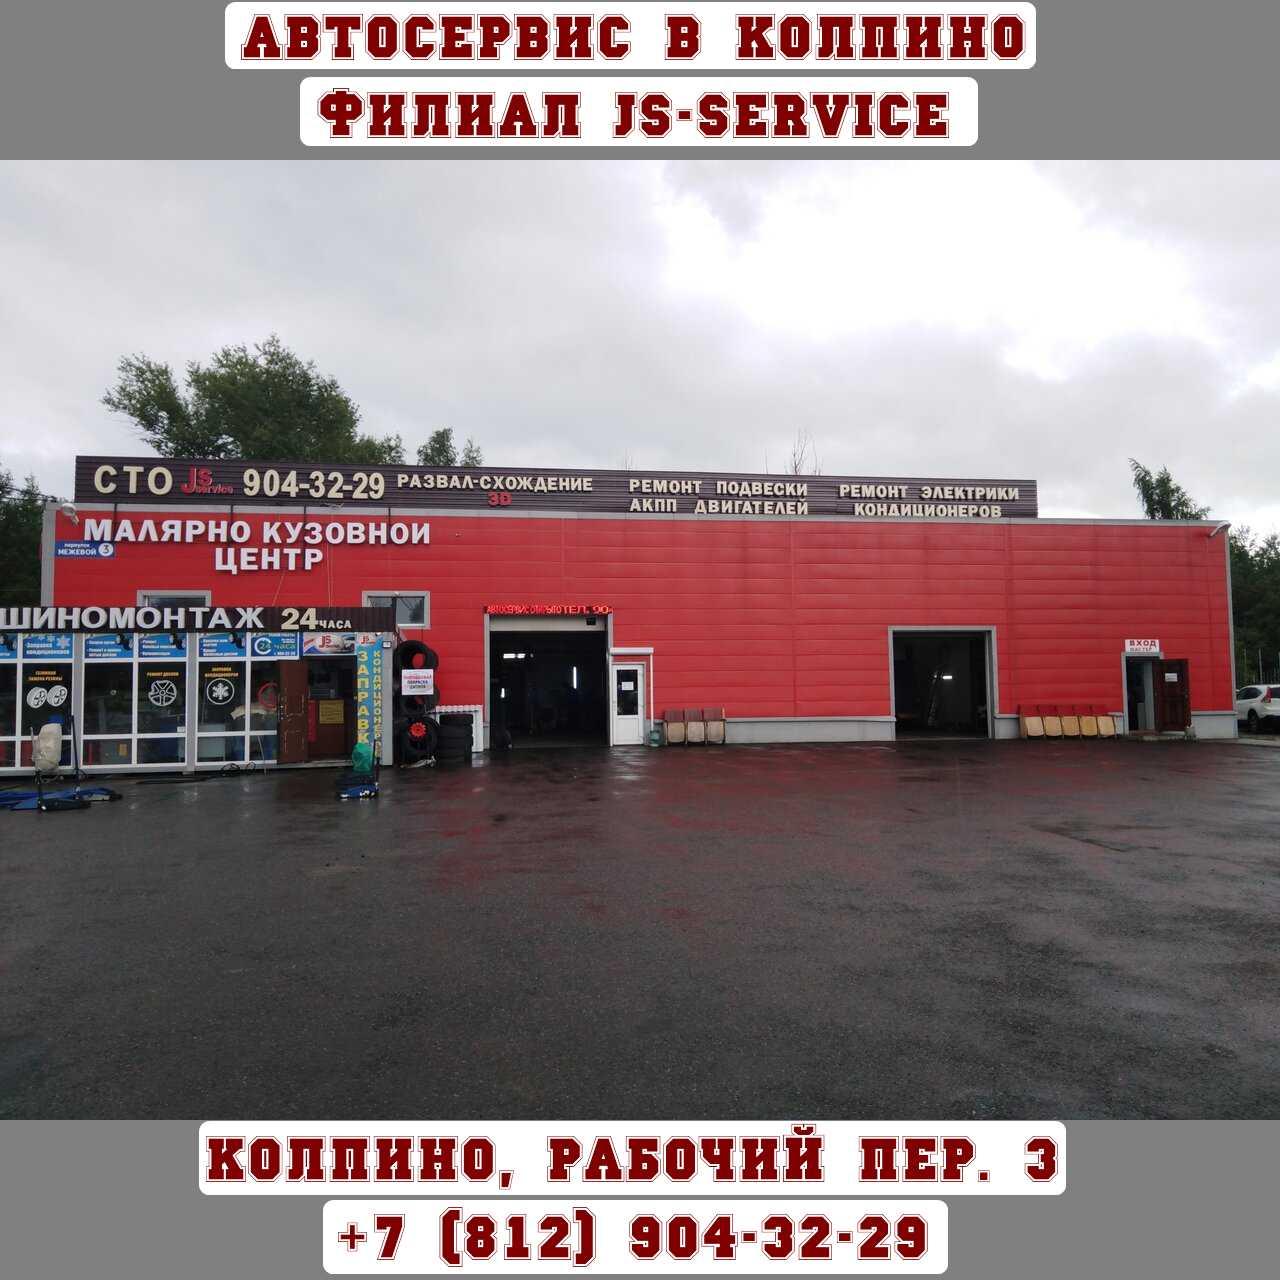 Автосервис JS-SERVICE в г. Колпино, Рабочий пер., д. 3